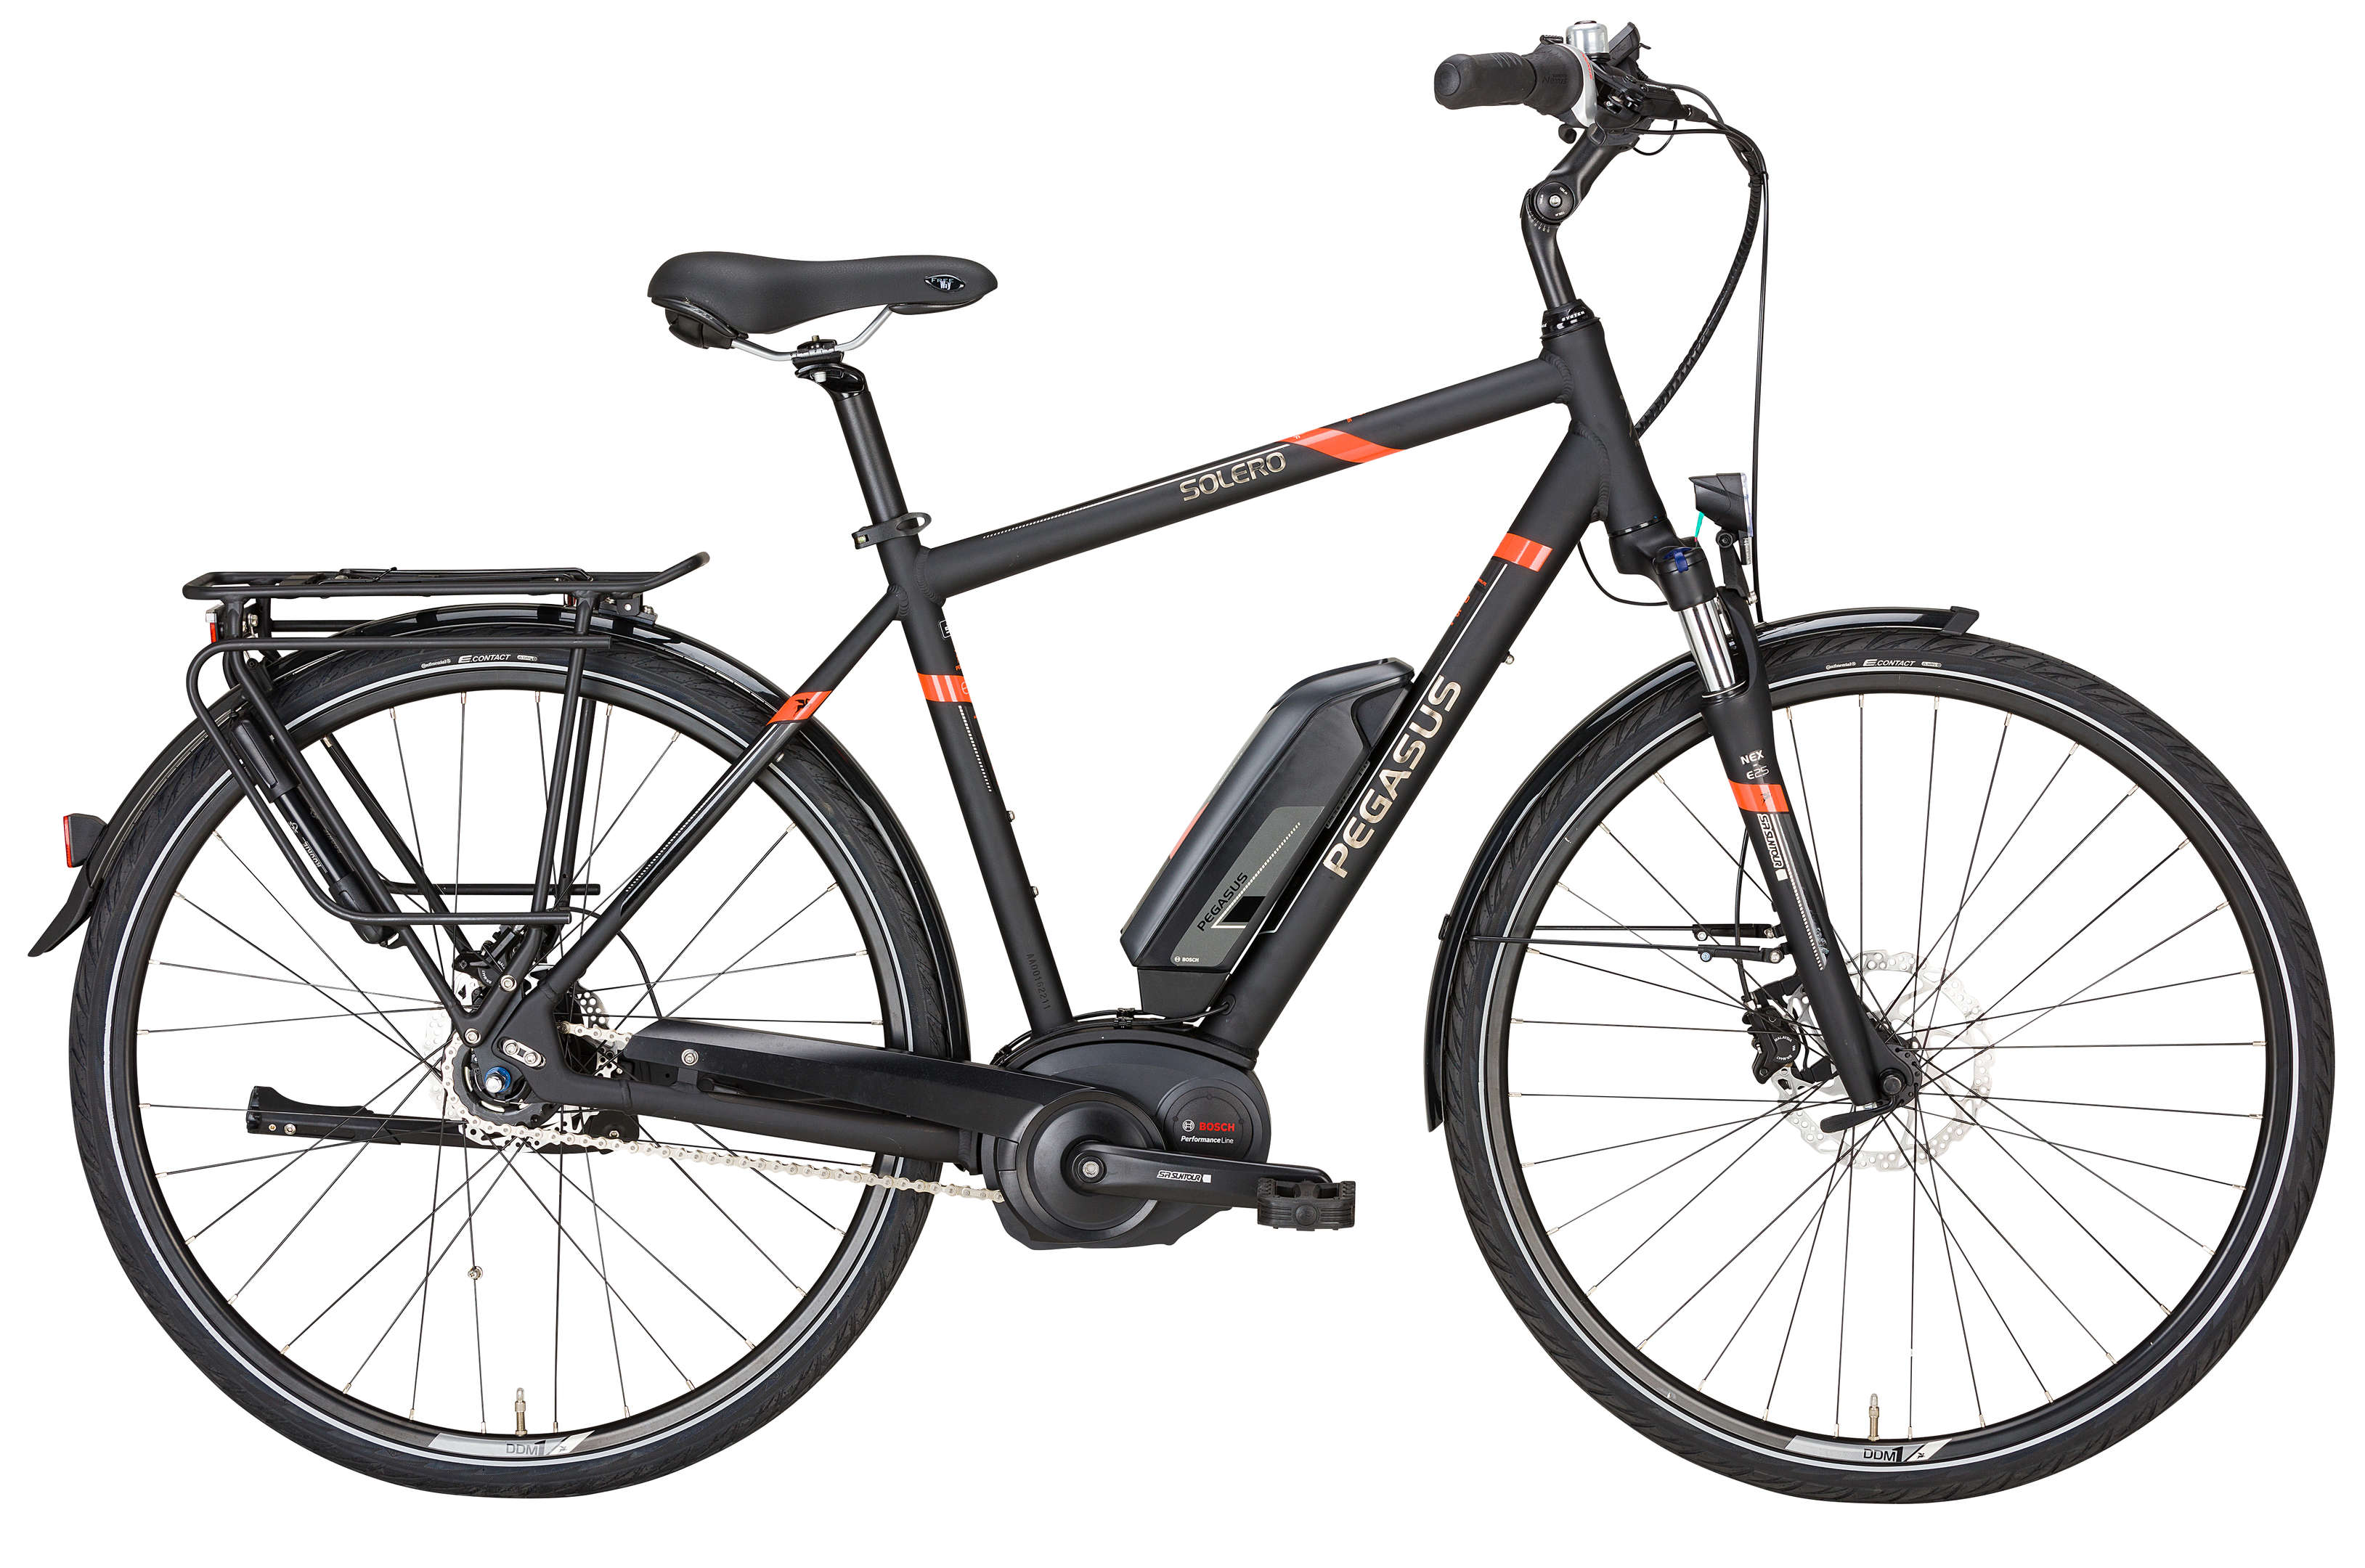 pegasus e bike solero e8f lt eurorad bikeleasingeurorad. Black Bedroom Furniture Sets. Home Design Ideas